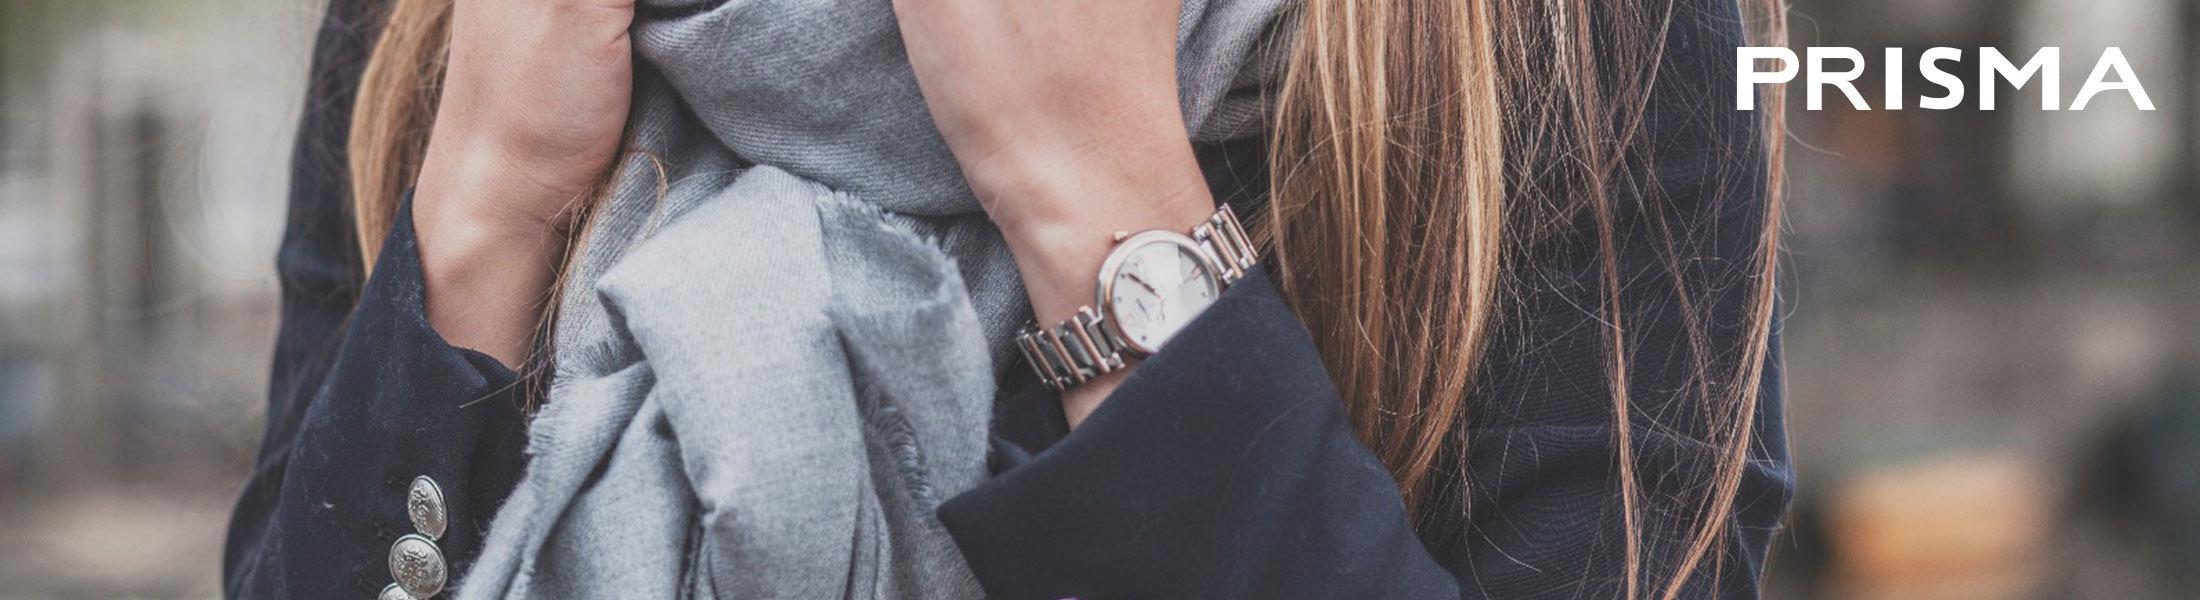 Prisma Dames Horloges